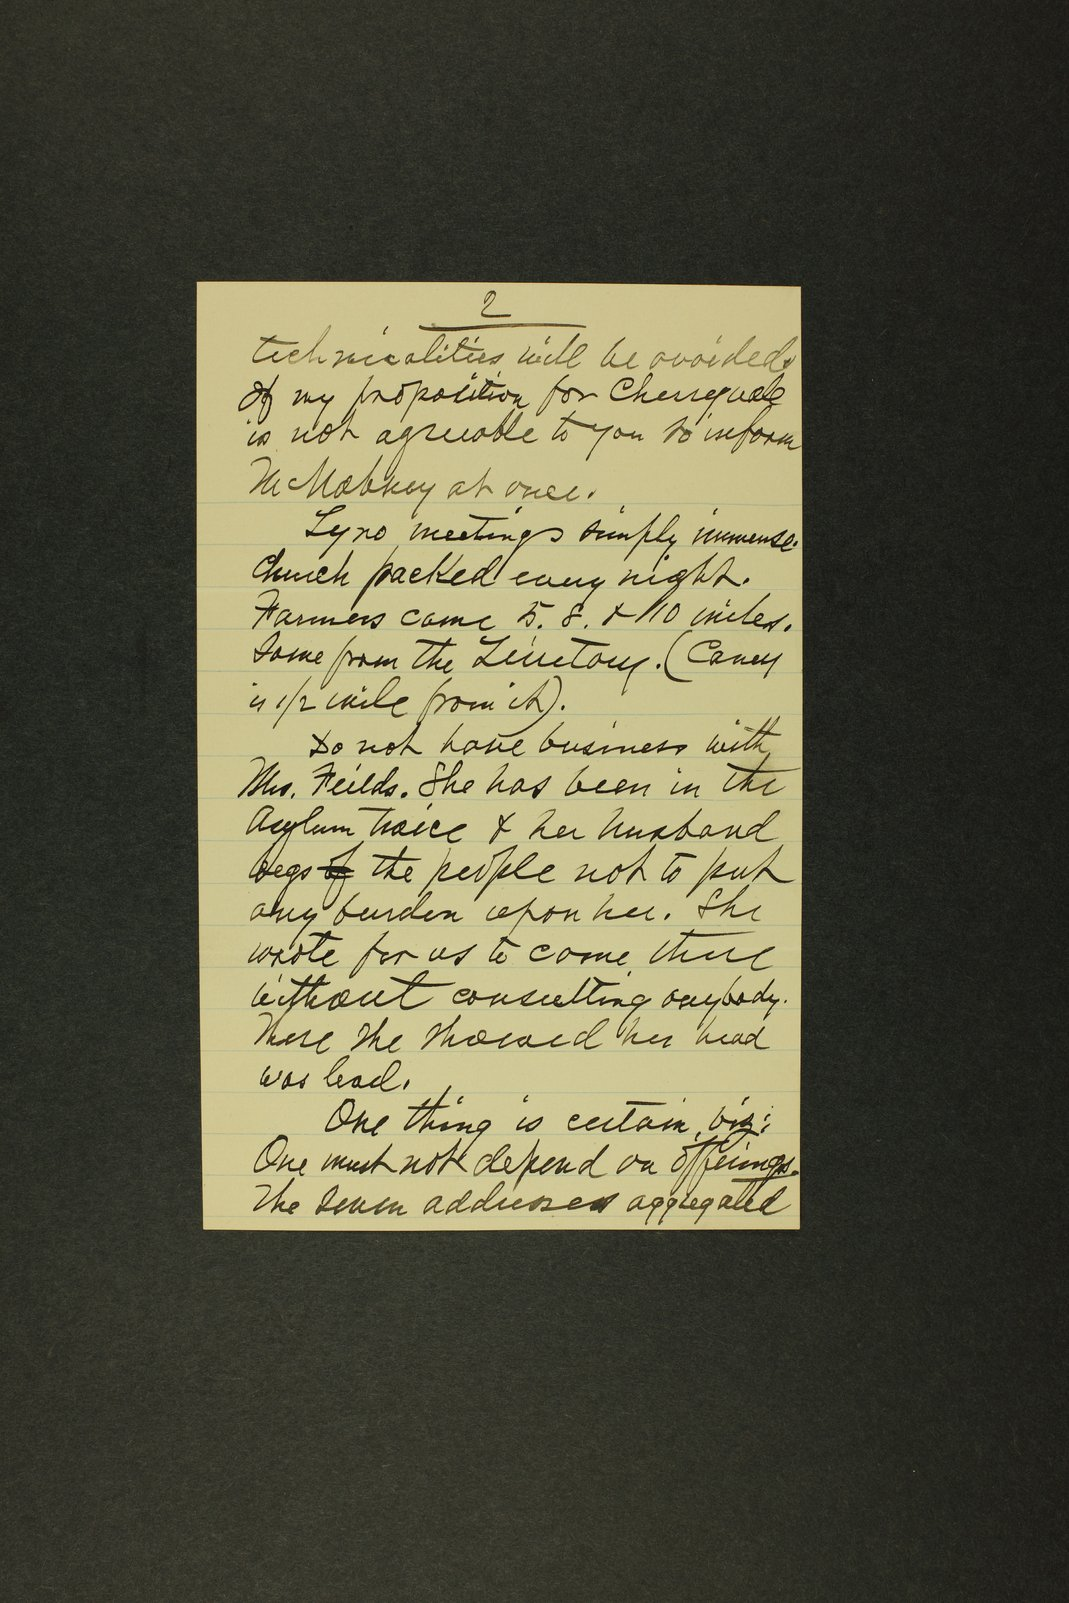 Temperance history correspondence - 9